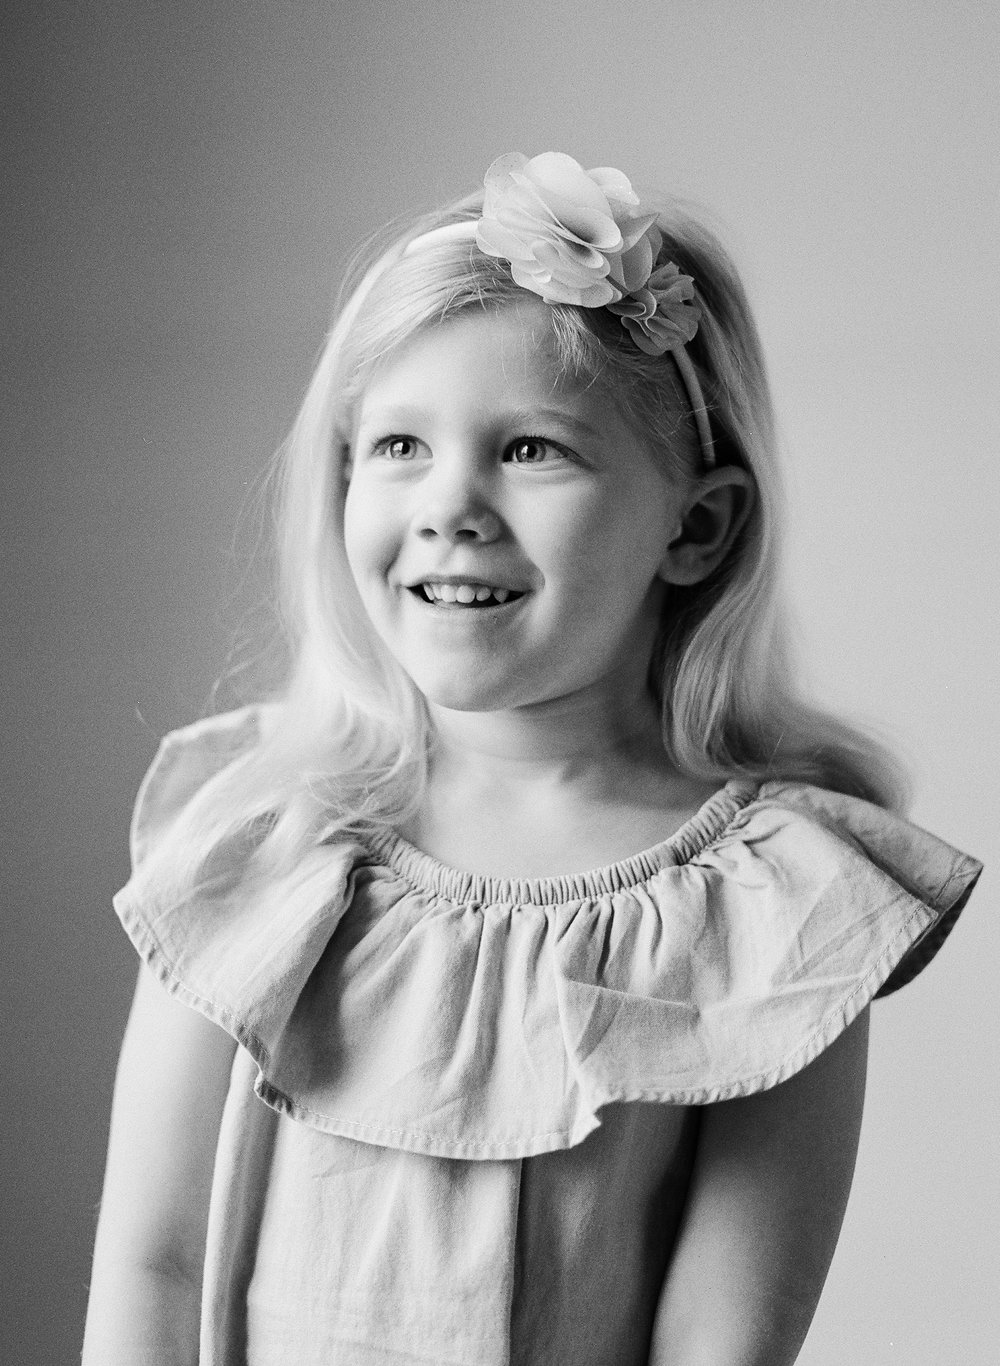 nashville-franklin-blackandwhite-childrens-portraiture-17.JPG